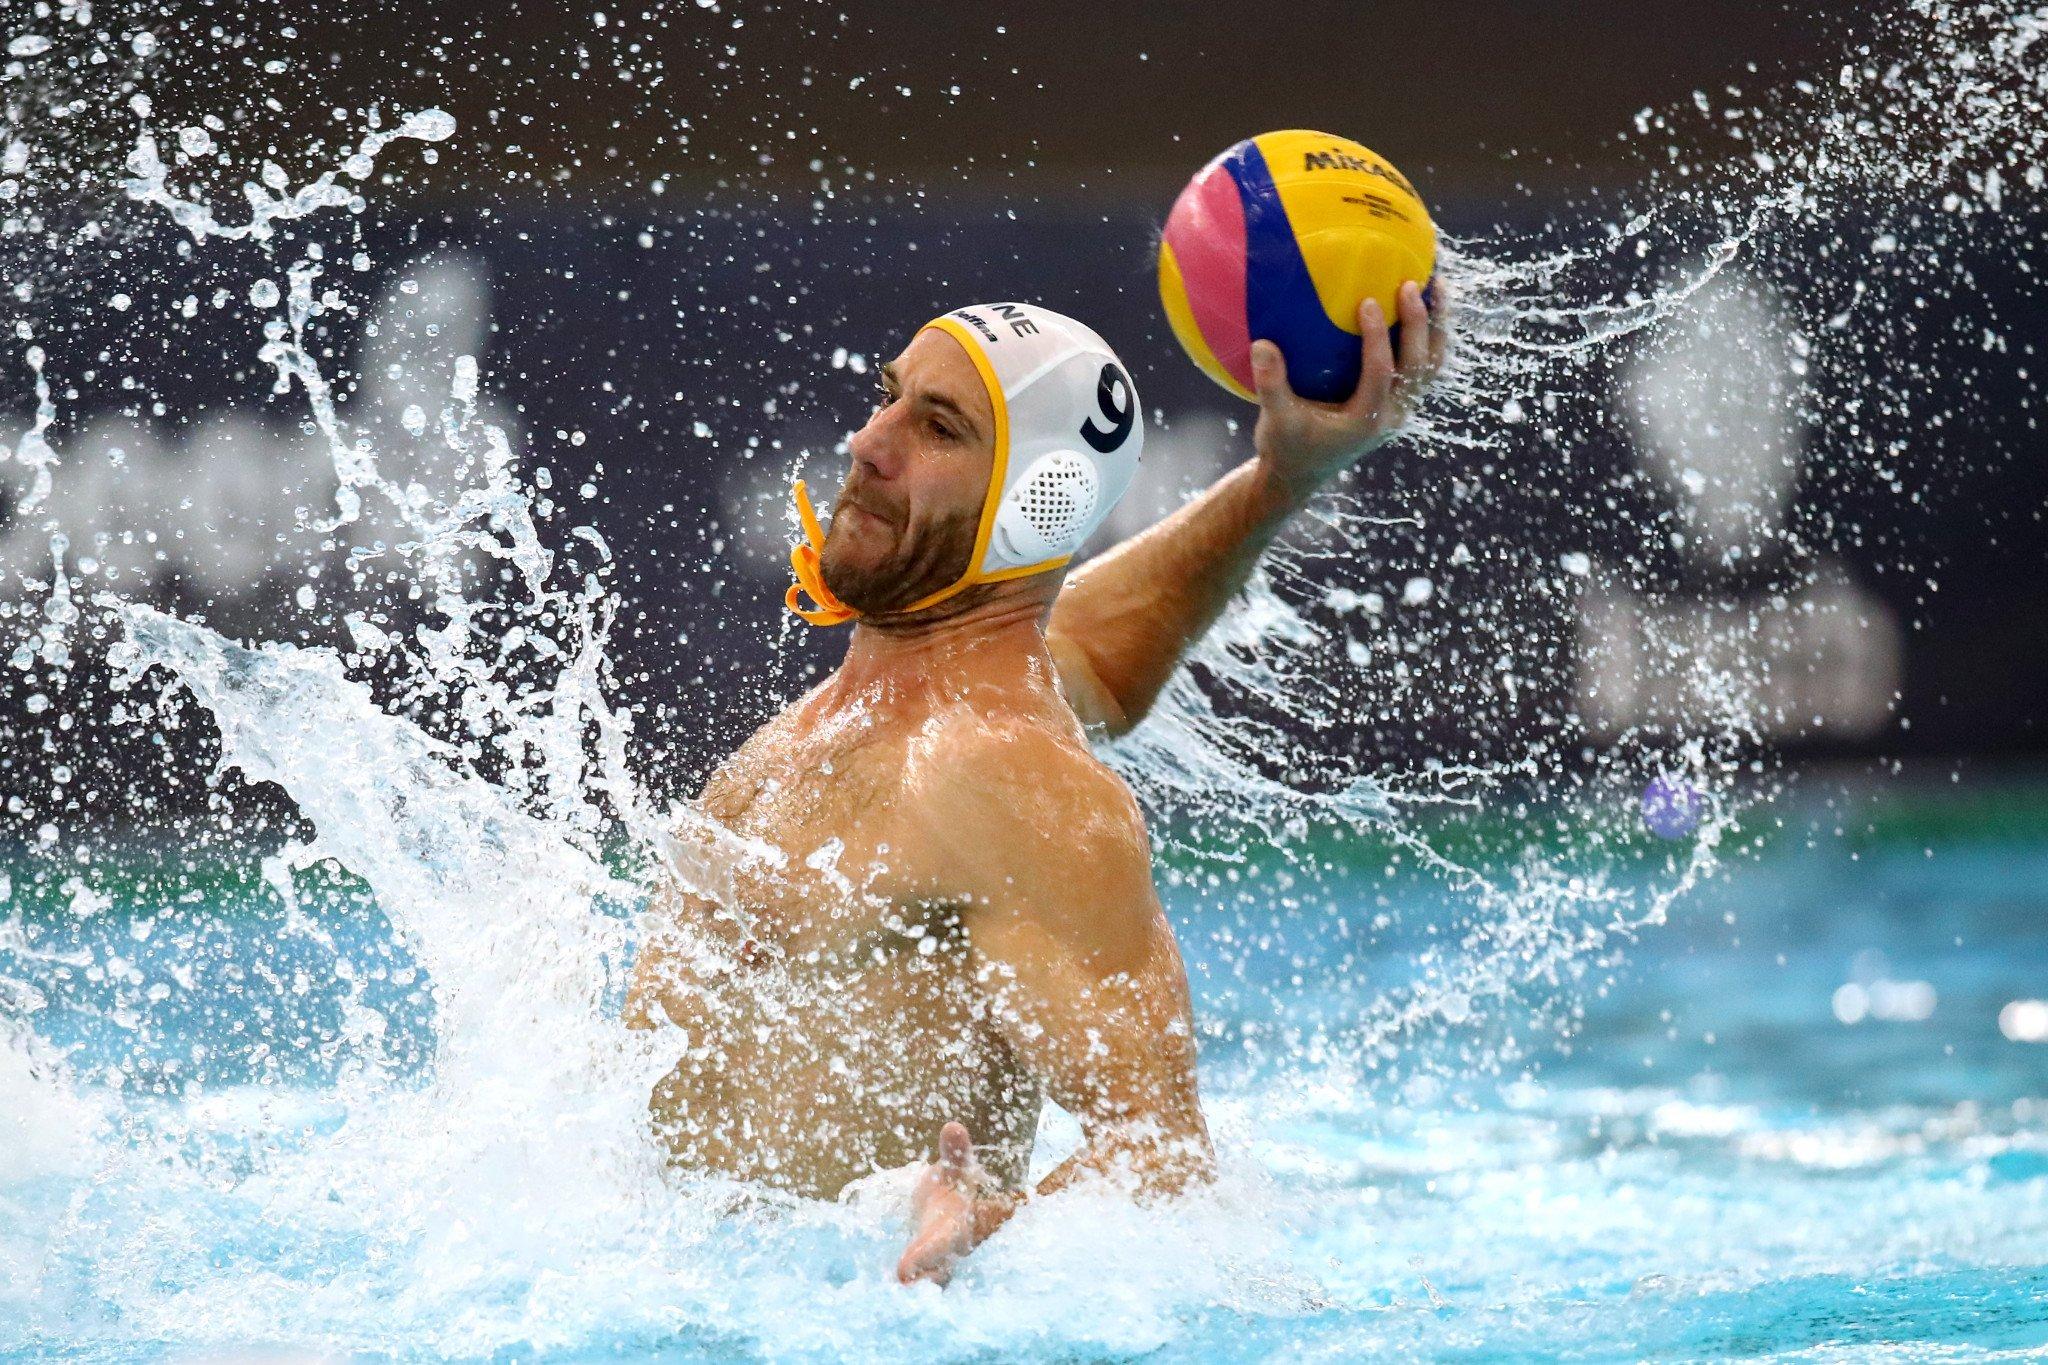 Alexander Ivovich helped Montenegro defeat Greece in Tbilisi © Getty Images